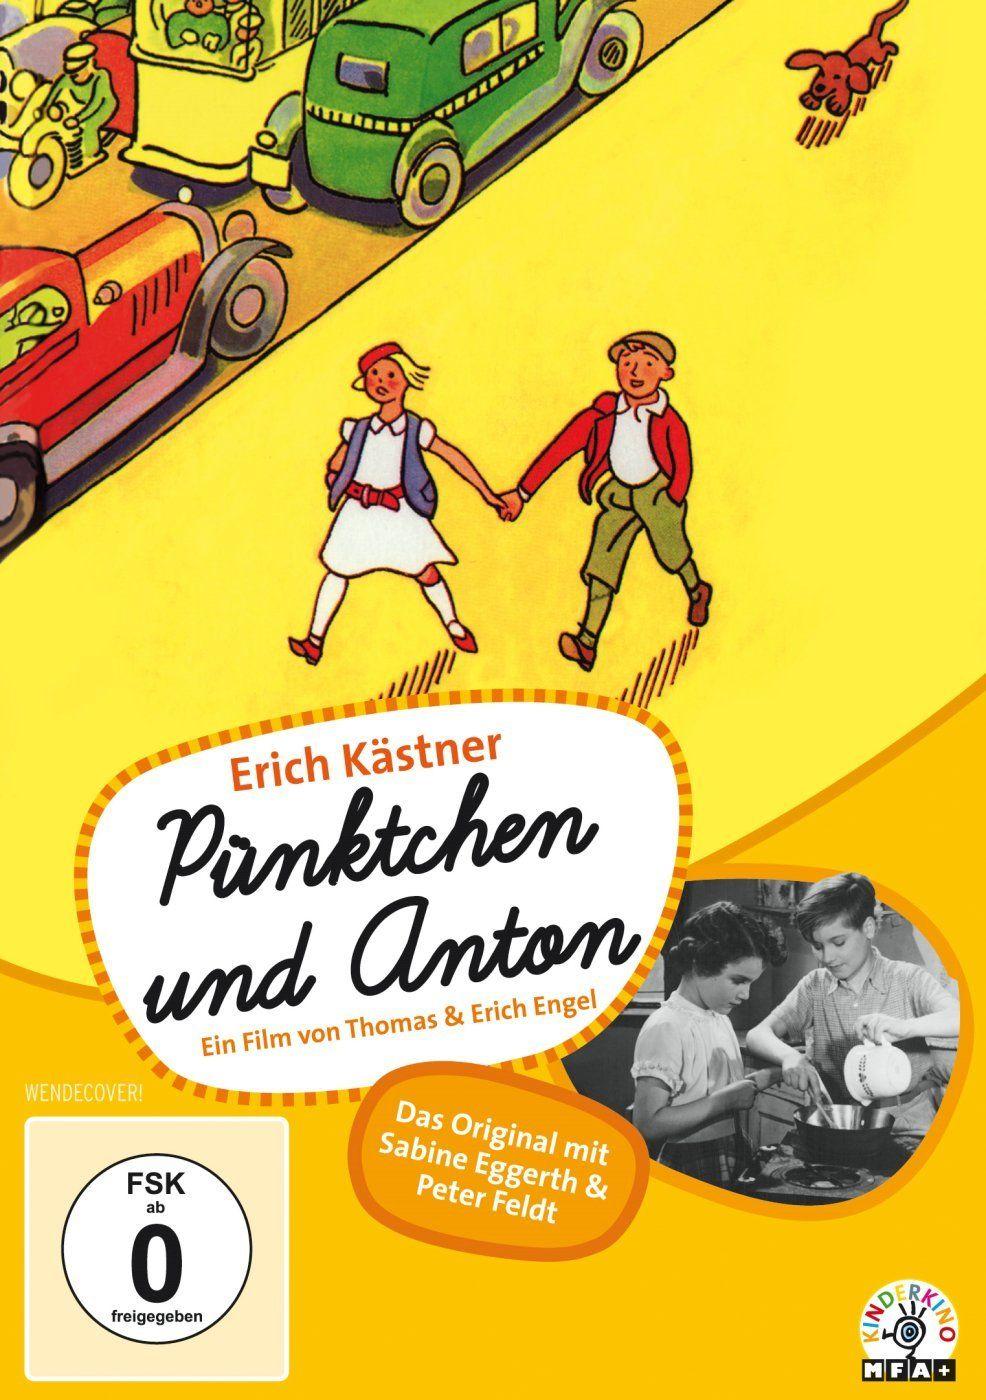 Punktchen Und Anton Punktchen Und Anton Anton Dvd